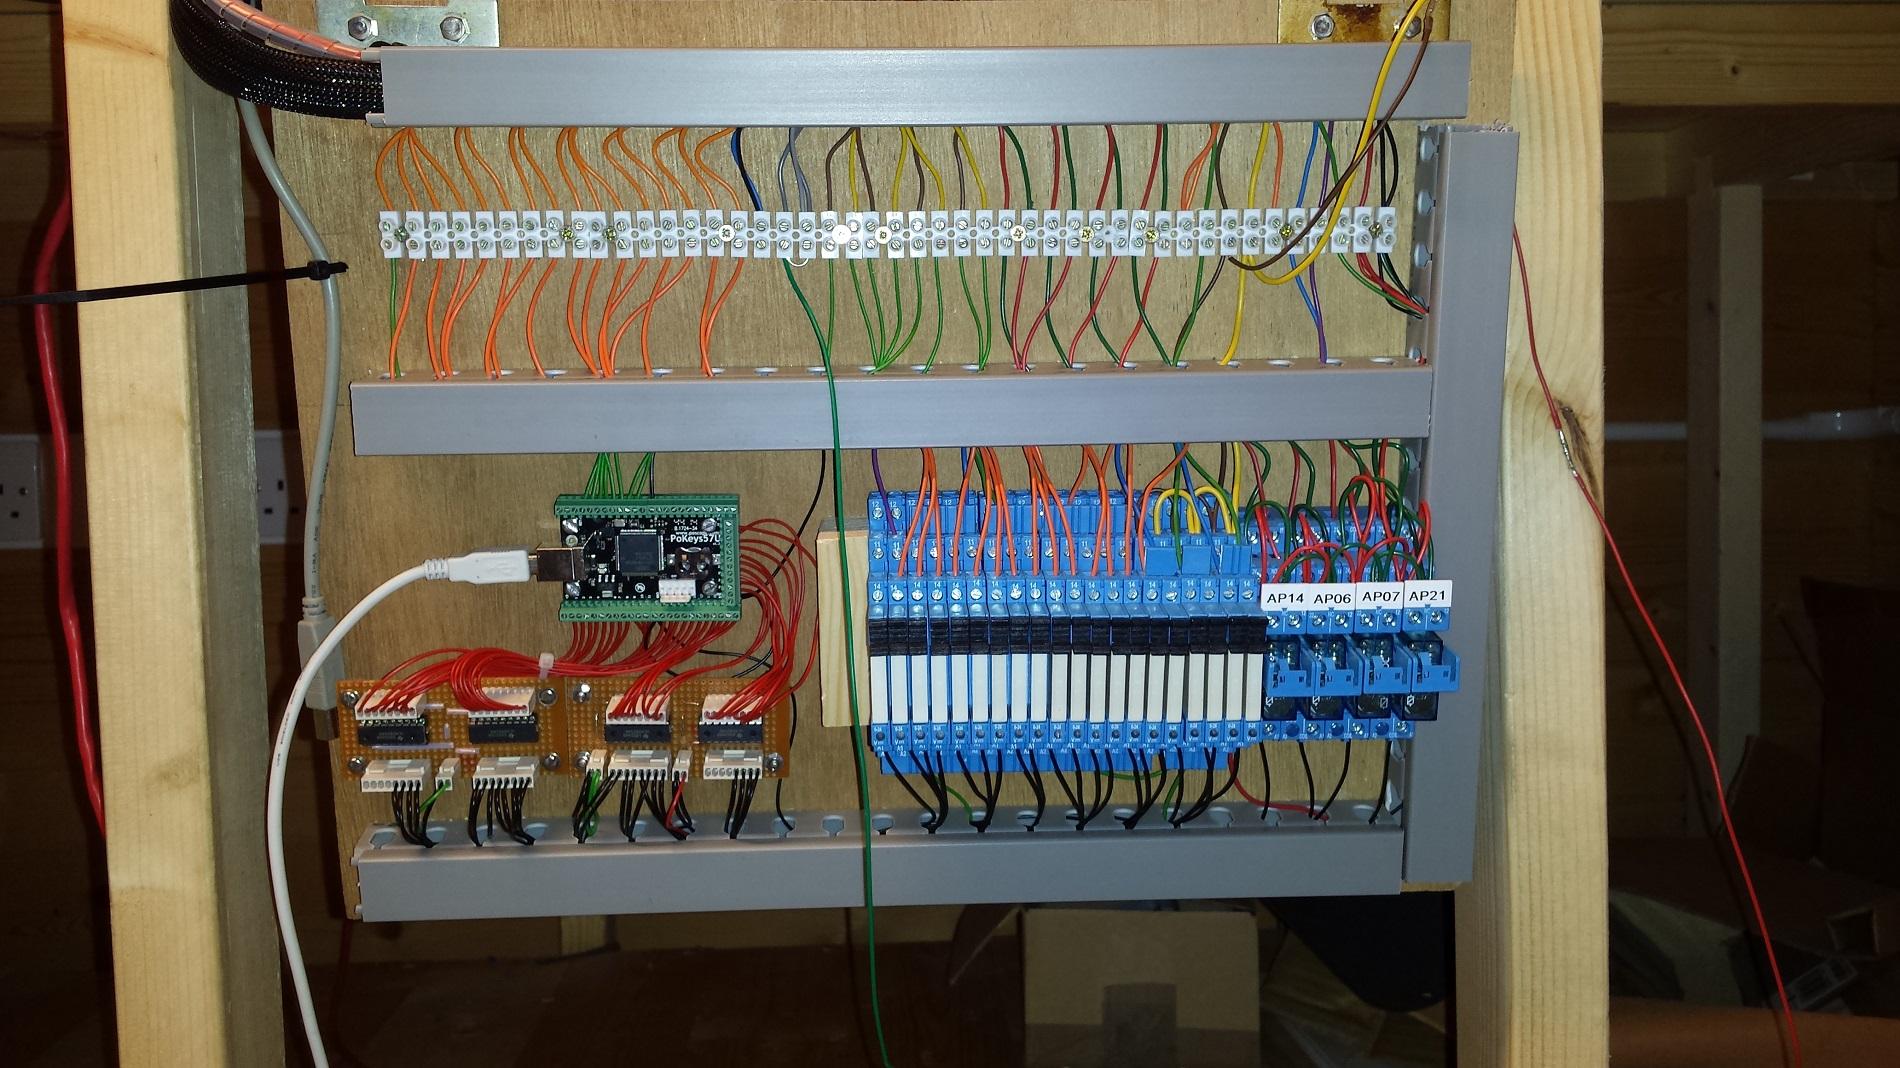 Photo 5: PoKeys57U interface boards